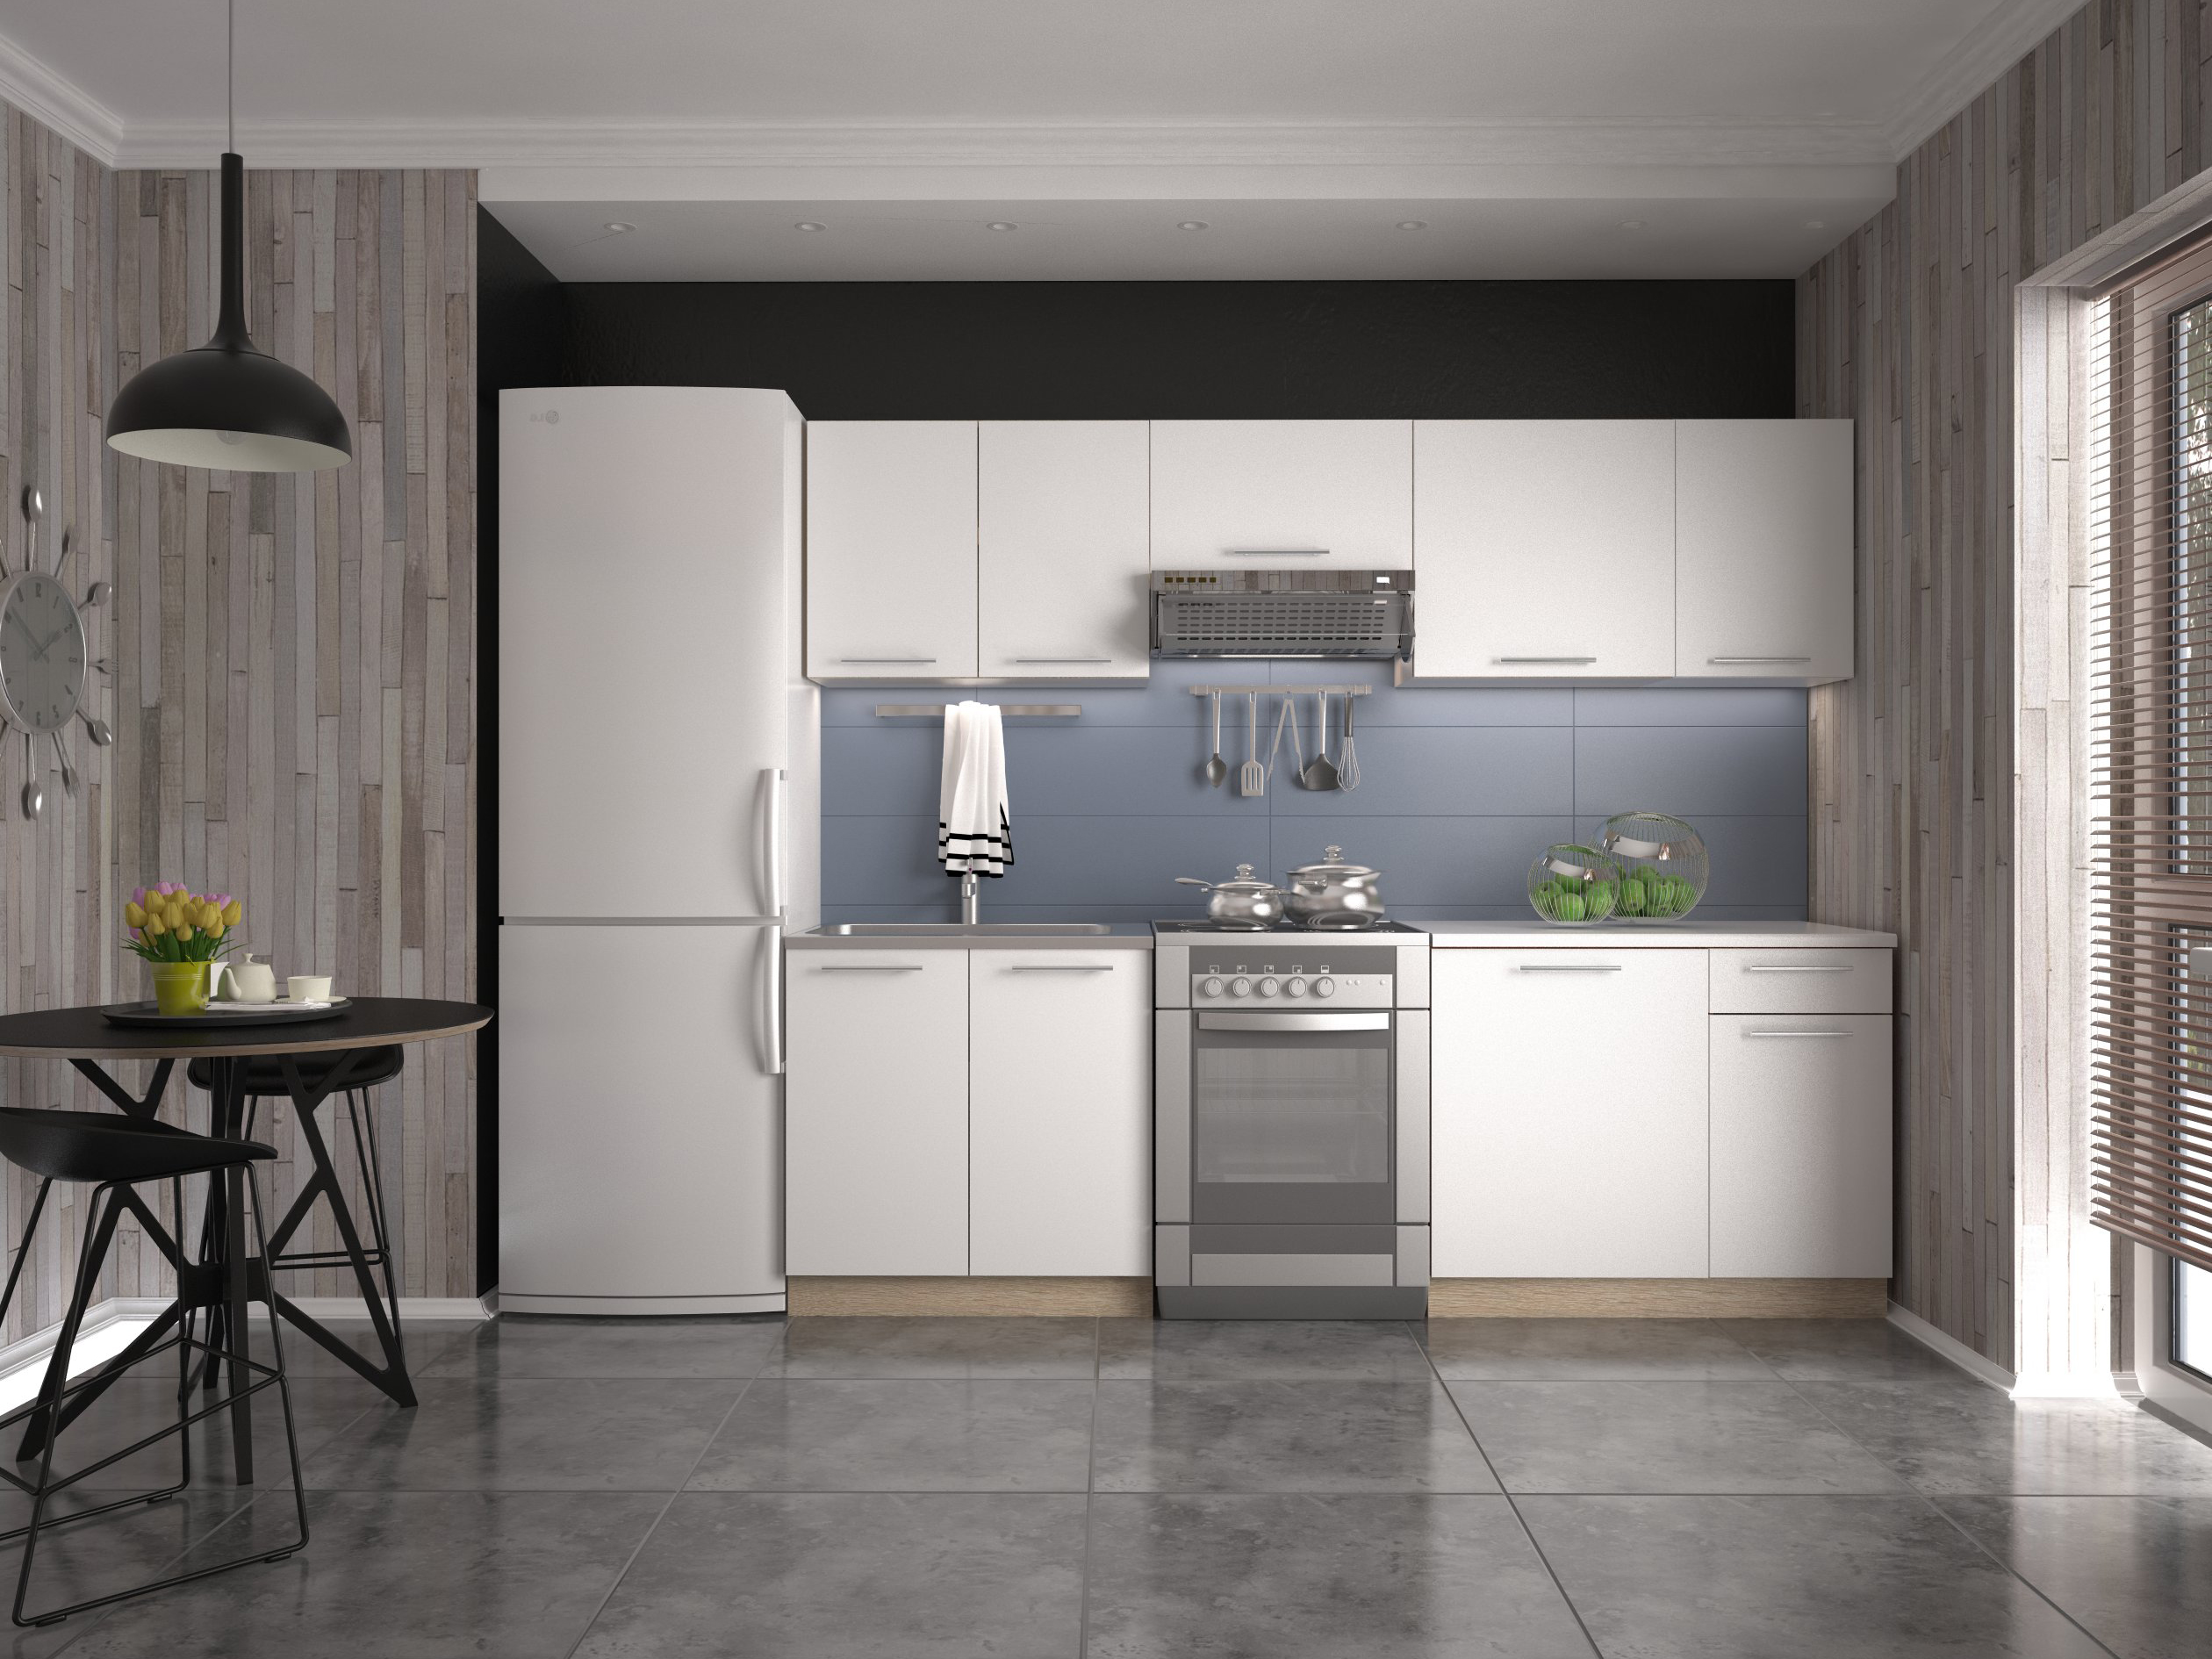 Kuchyňa Daria 240 cm  NovýNábytok sk -> Wnetrza Leroy Merlin Kuchnia